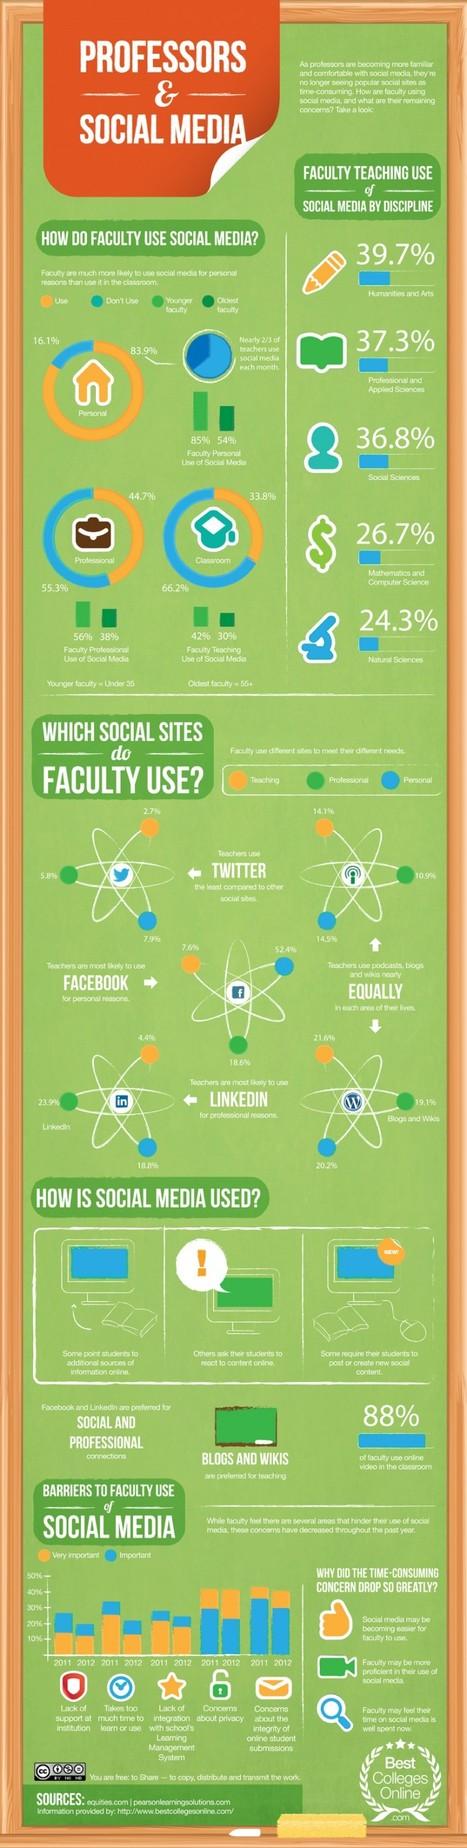 This Is How Professors Are Using Social Media - Edudemic | Social Media 4 Education | Scoop.it